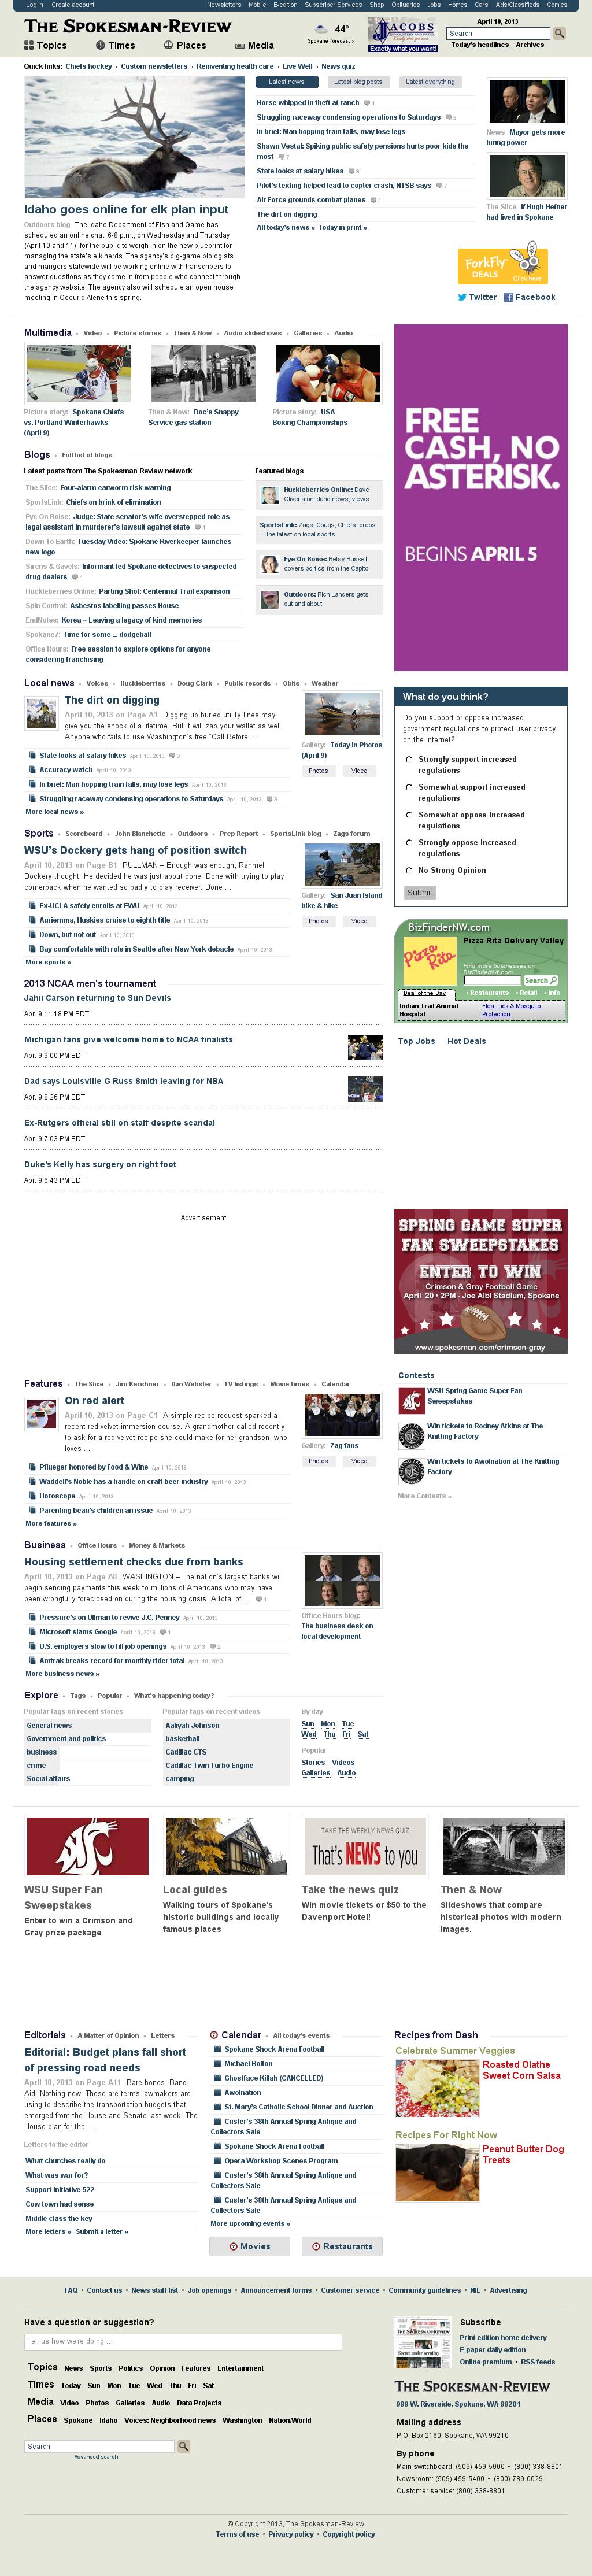 The (Spokane) Spokesman-Review at Wednesday April 10, 2013, 12:21 p.m. UTC